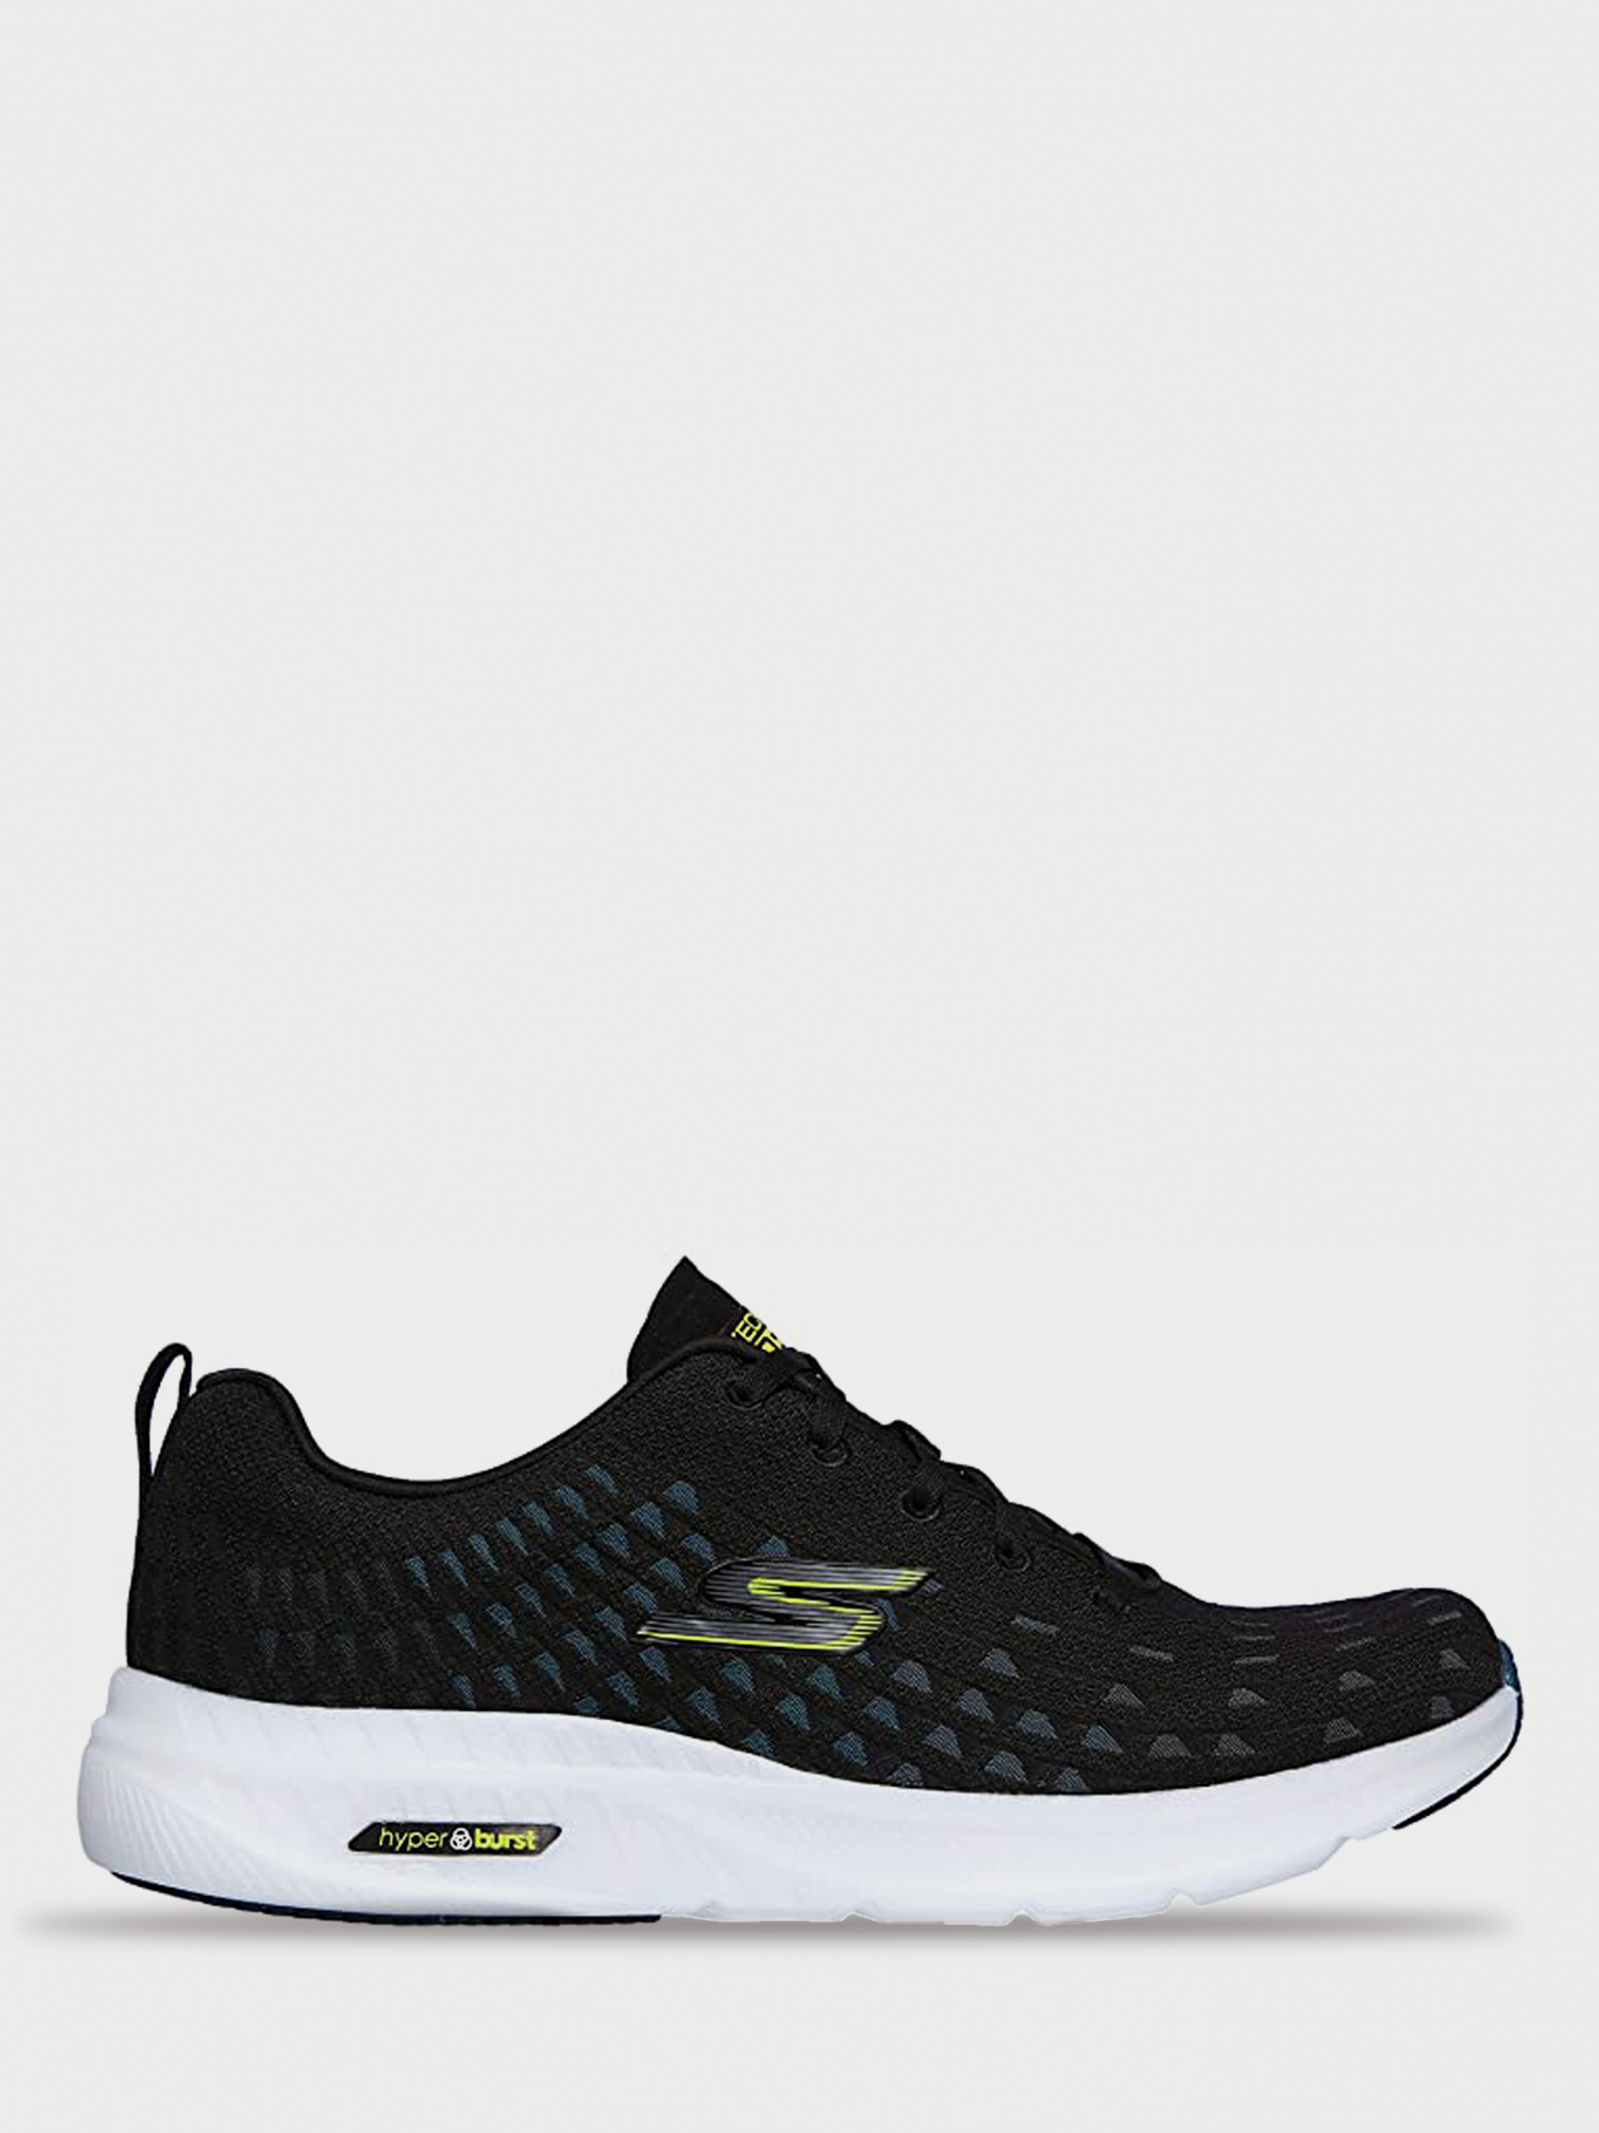 Кроссовки для мужчин Skechers Performance KM3786 купить в Интертоп, 2017